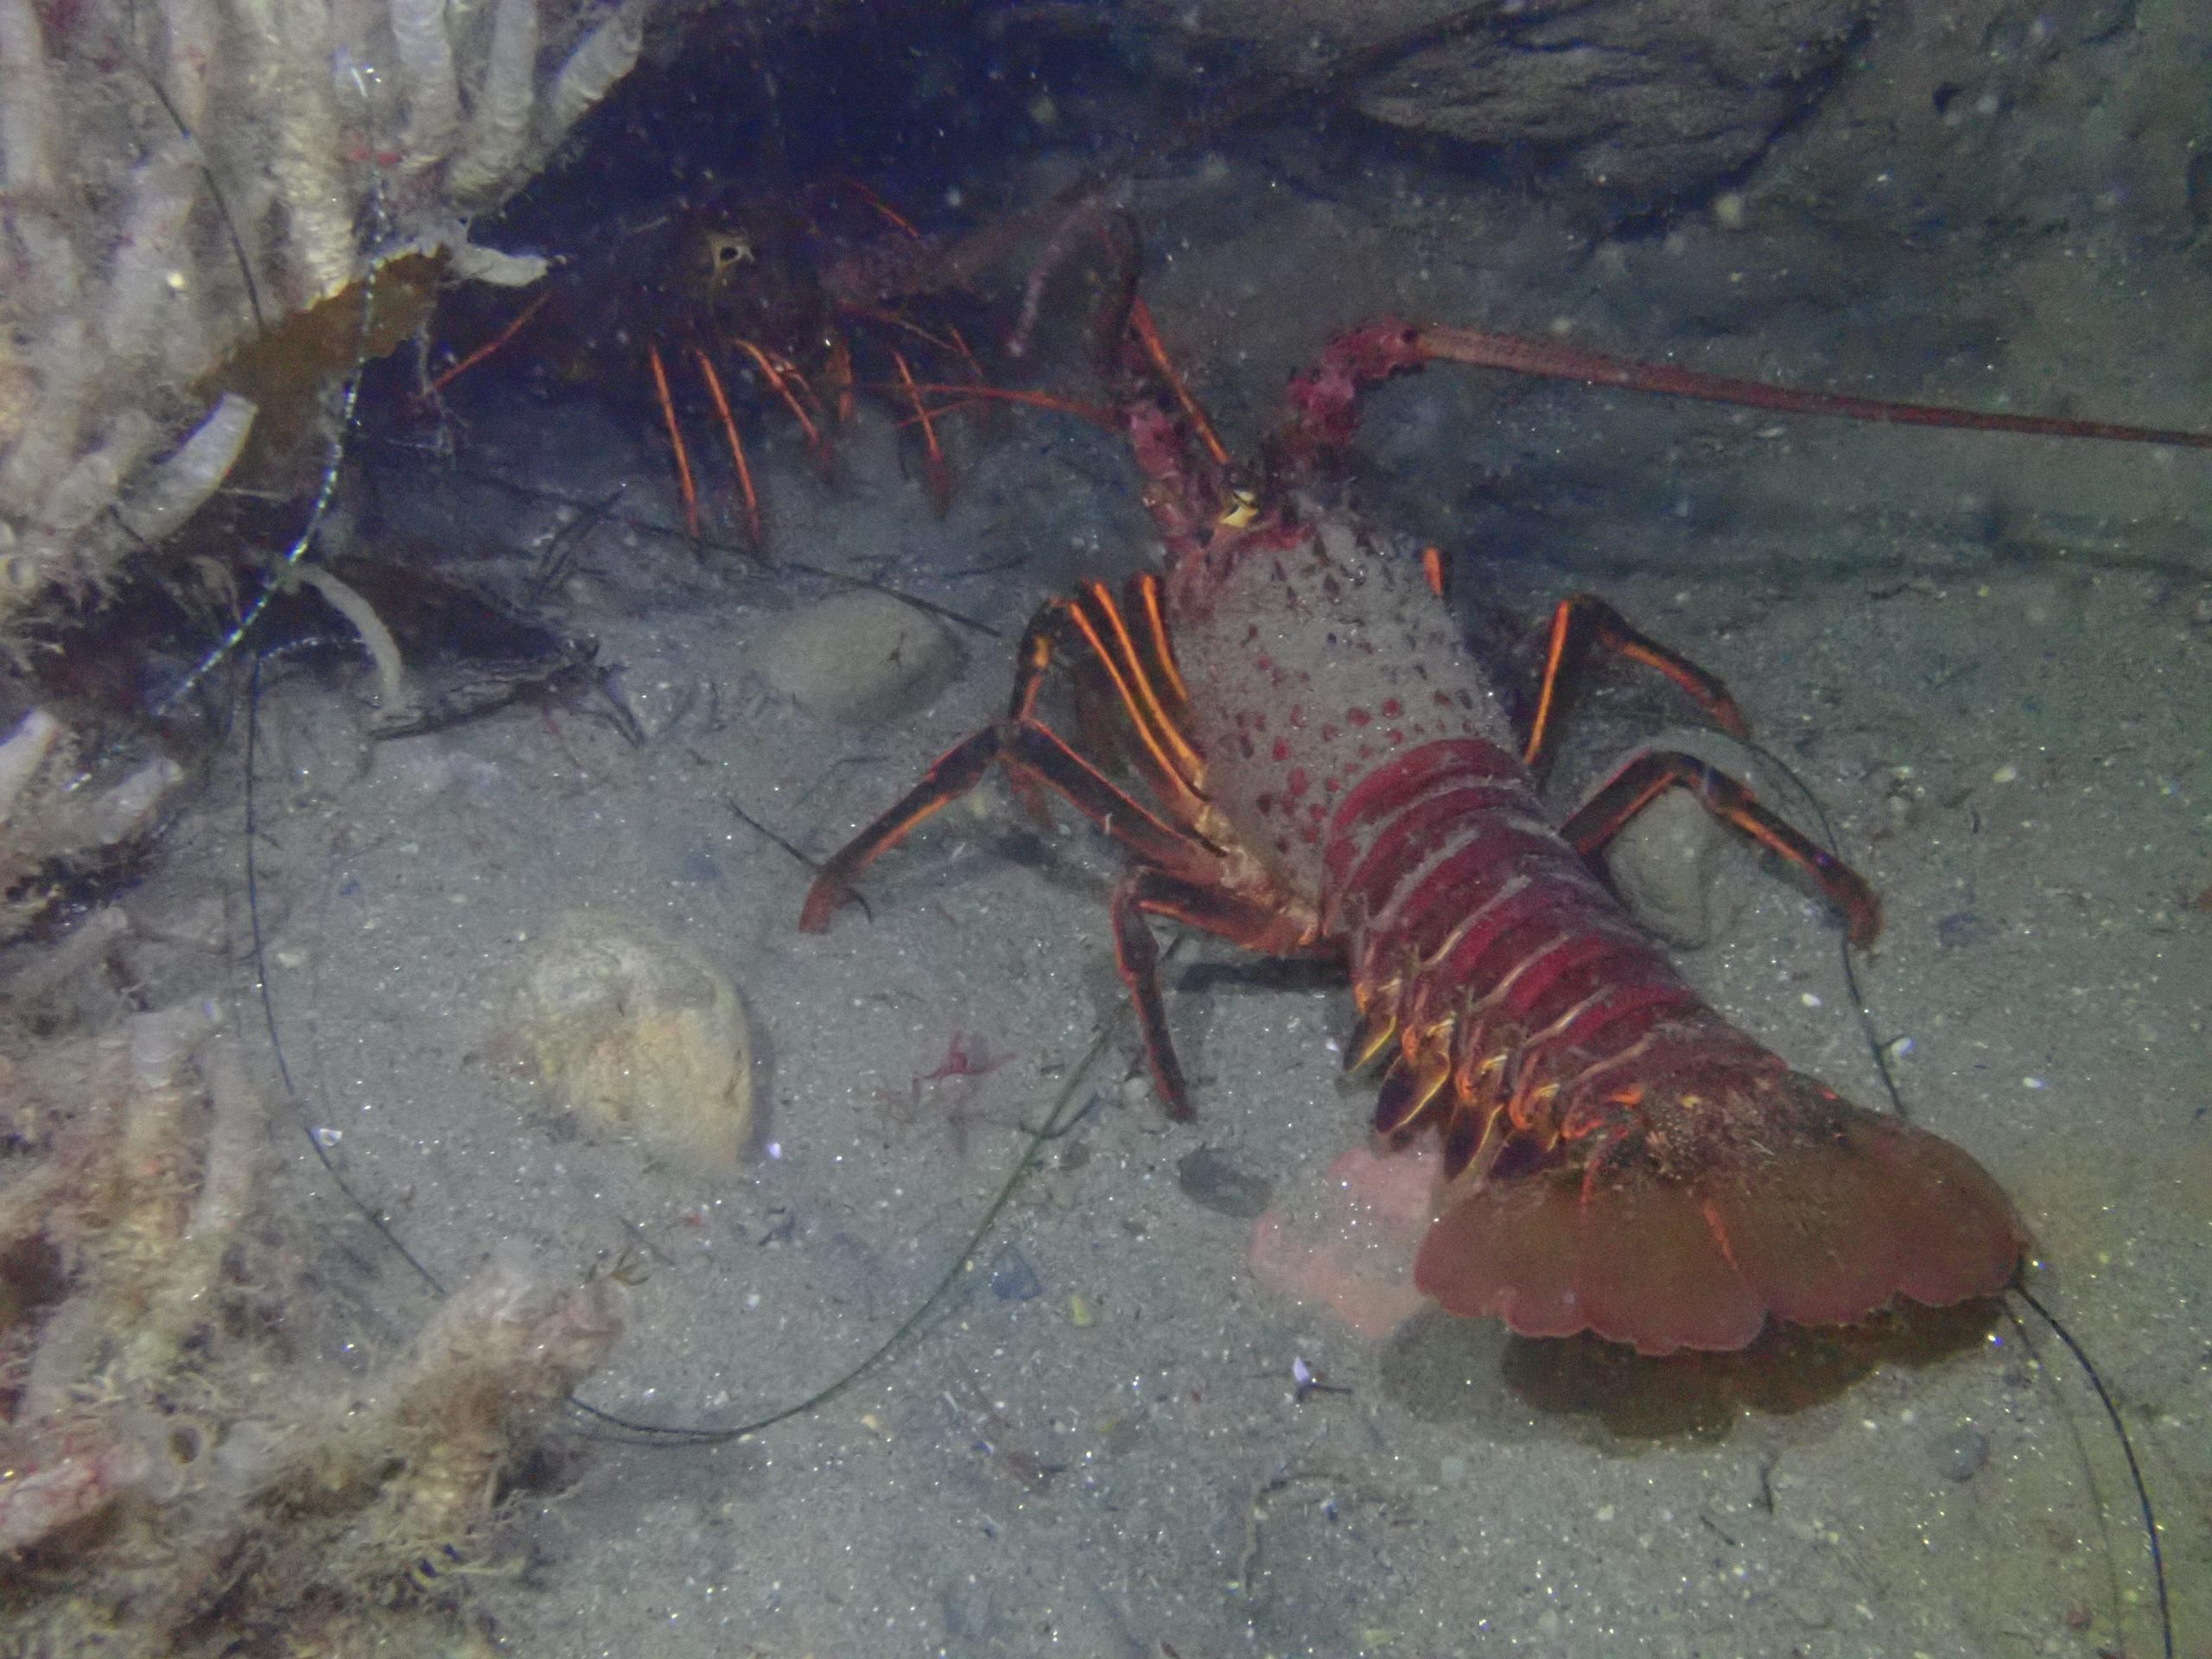 California Spiny Lobsters at La Jolla Cove